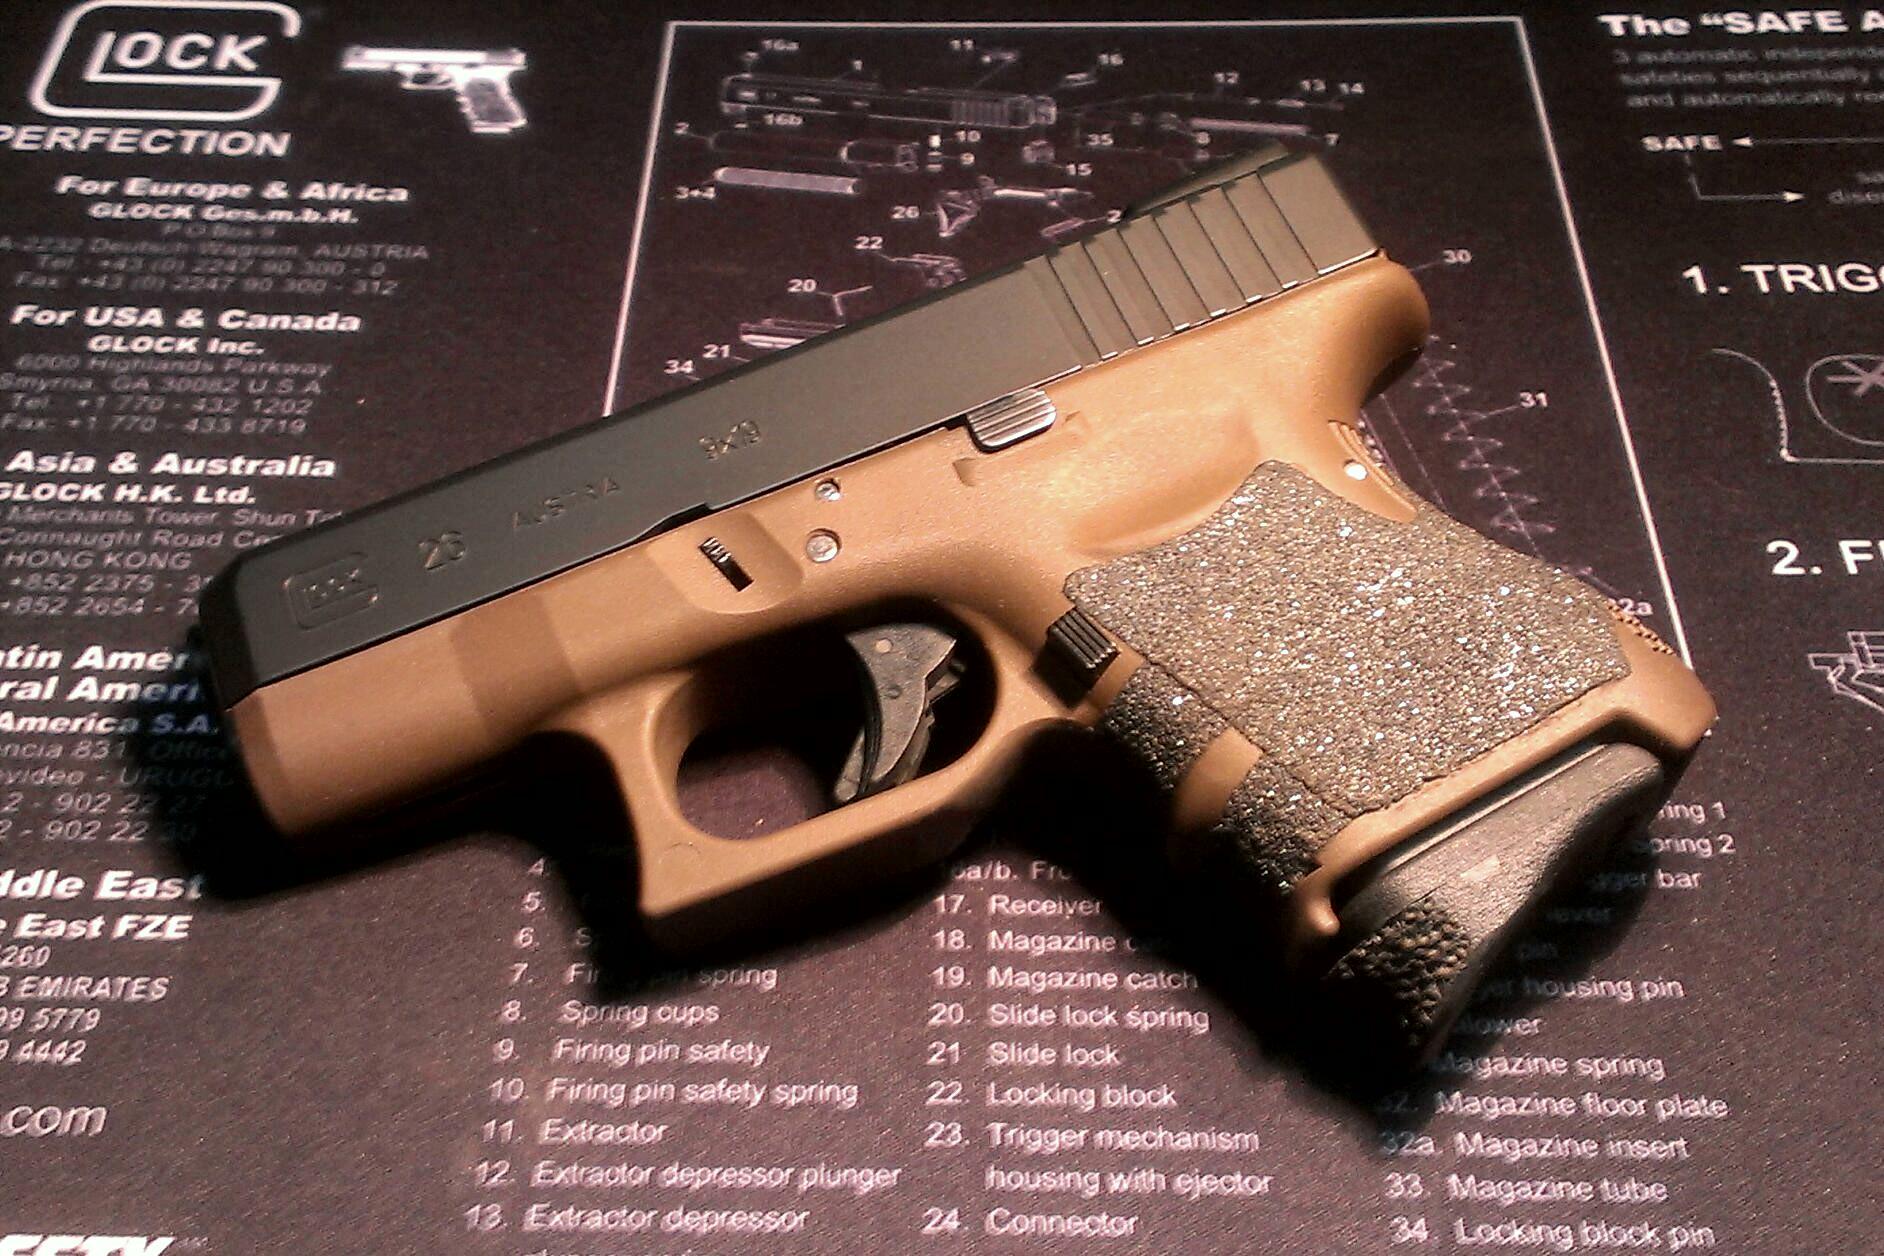 My EDC Glock-imag5435_1_1.jpg